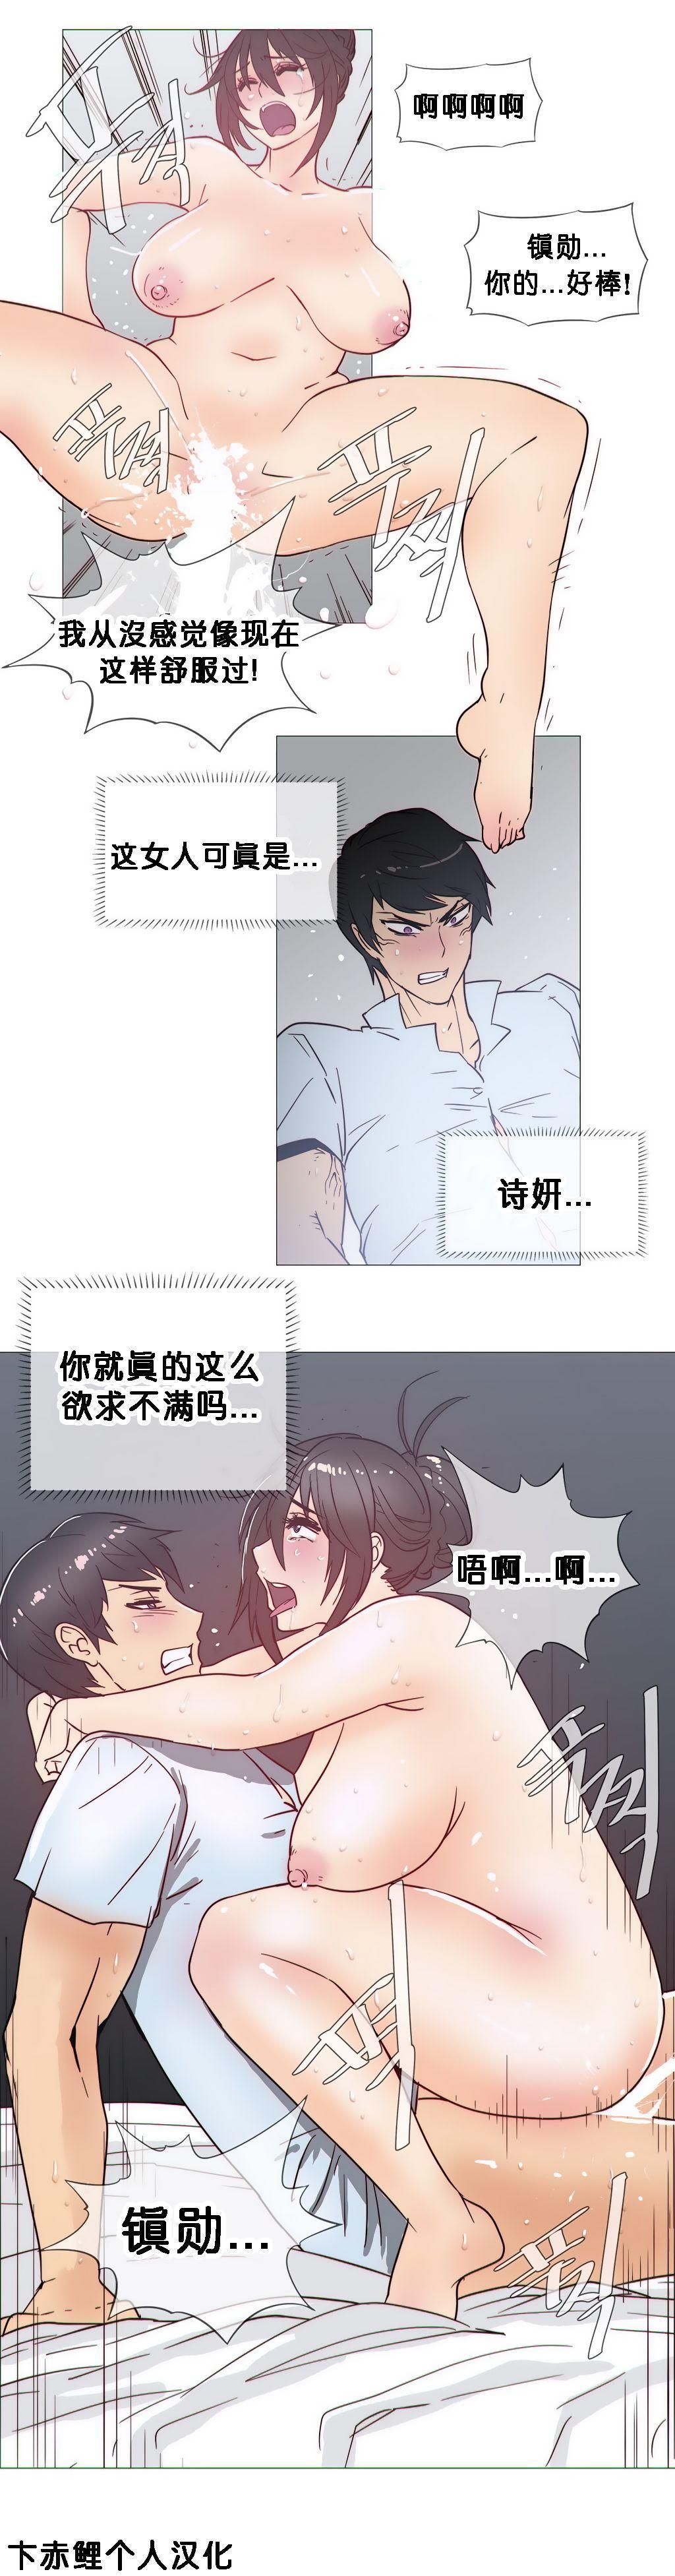 HouseHold Affairs 【卞赤鲤个人汉化】1~33话(持续更新中) 519